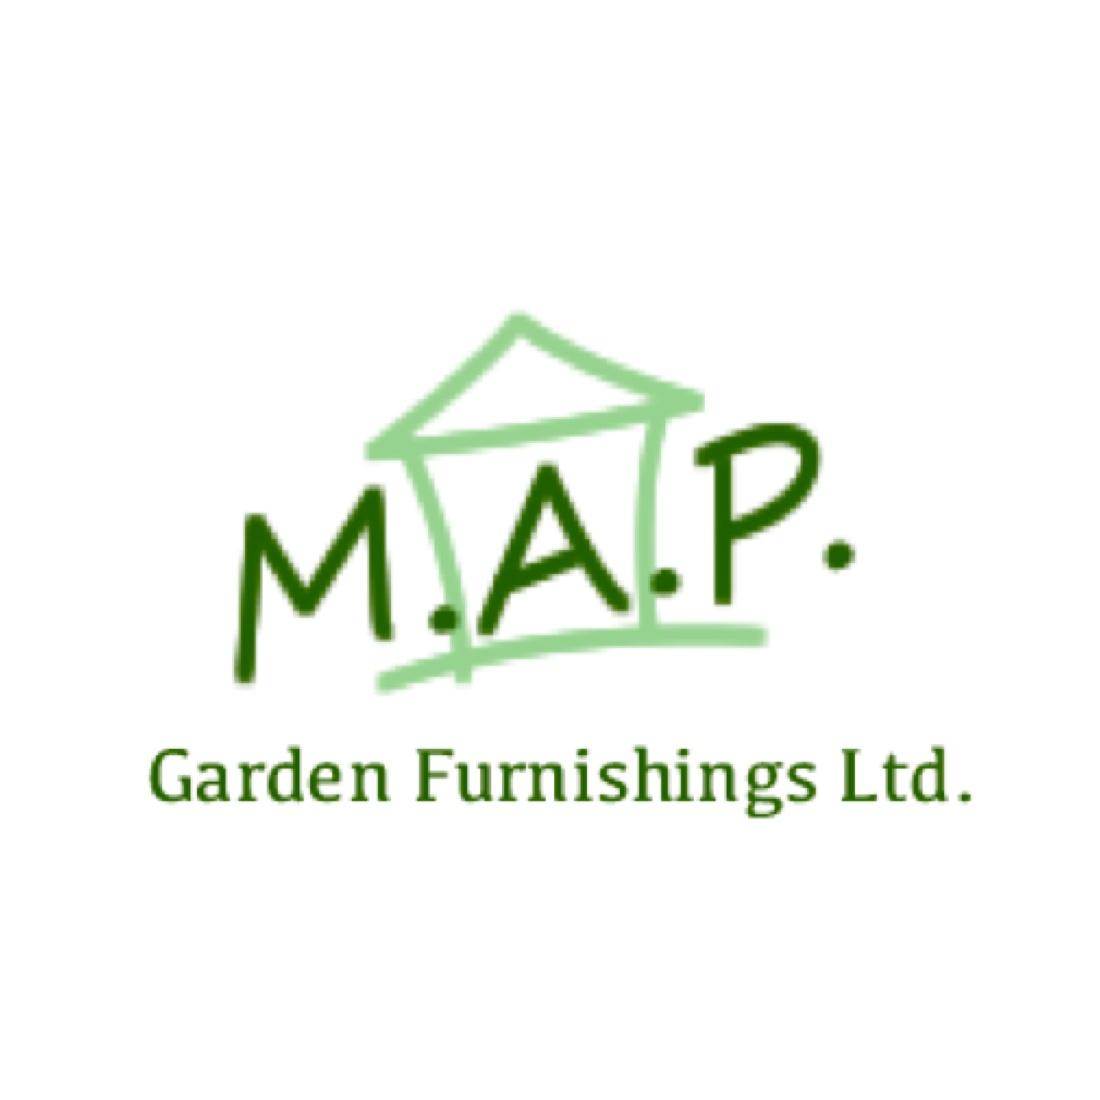 Shire Elveden Pine Lodge 70mm - 14 x 26ft